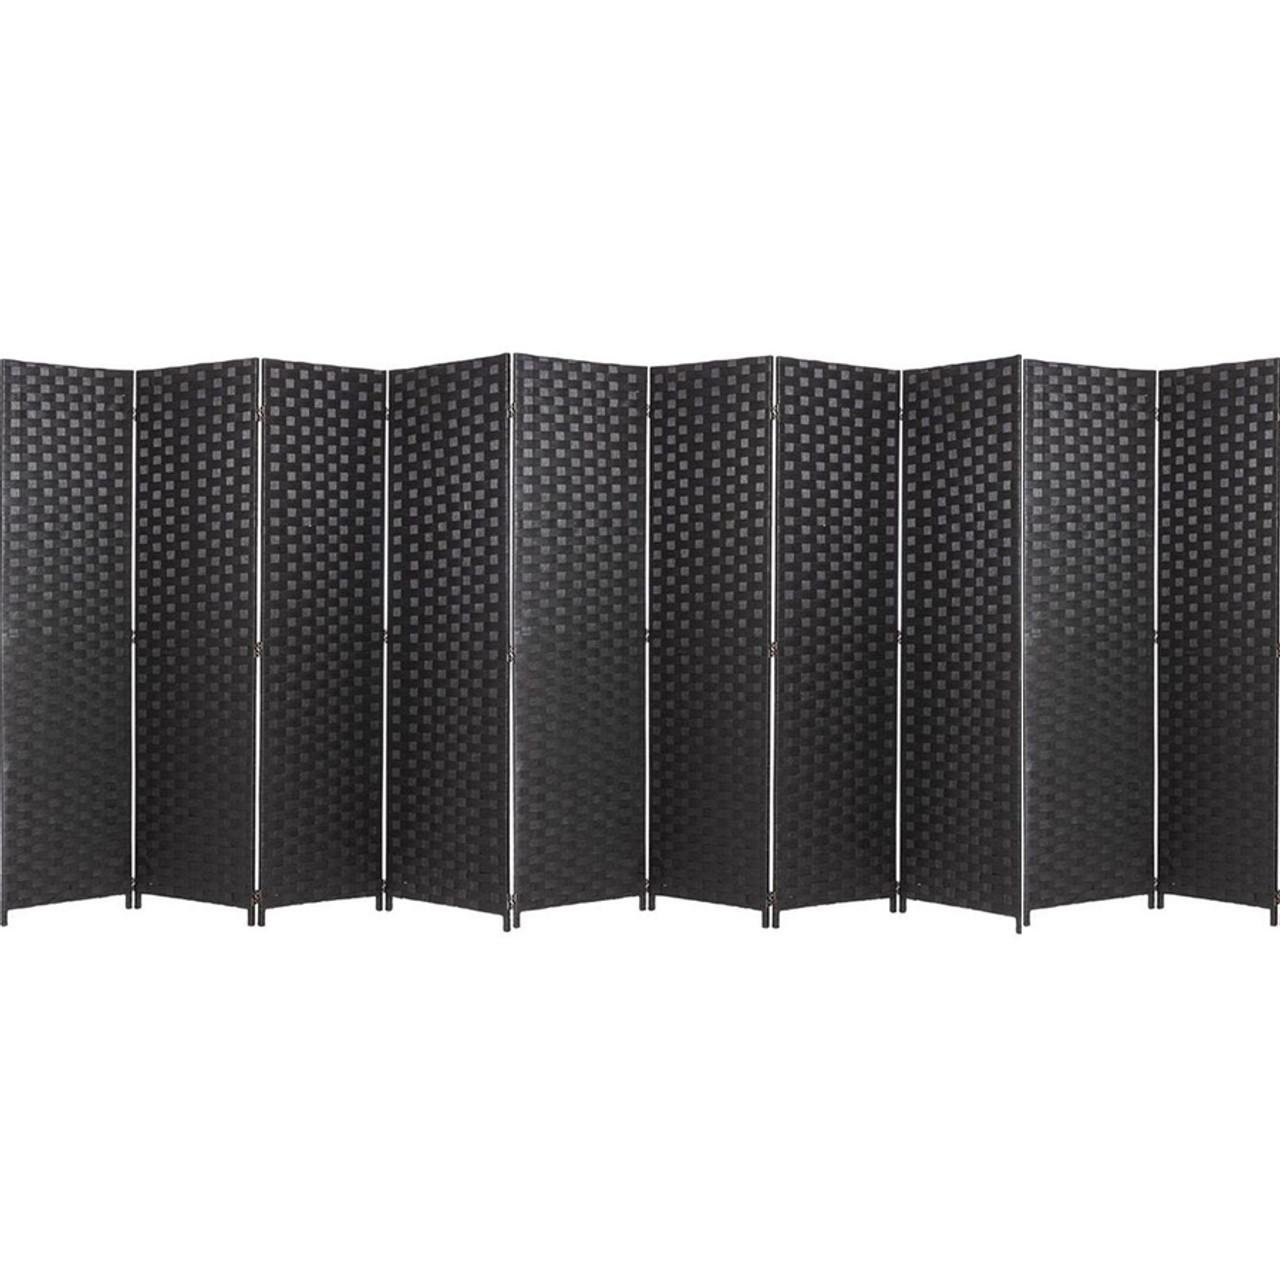 10 Panel Room Divider Privacy Screen, Bamboo Woven Panel in USA, California, New York, NY City, Los Angeles, San Francisco, Pennsylvania, Washington DC, Virginia, Maryland